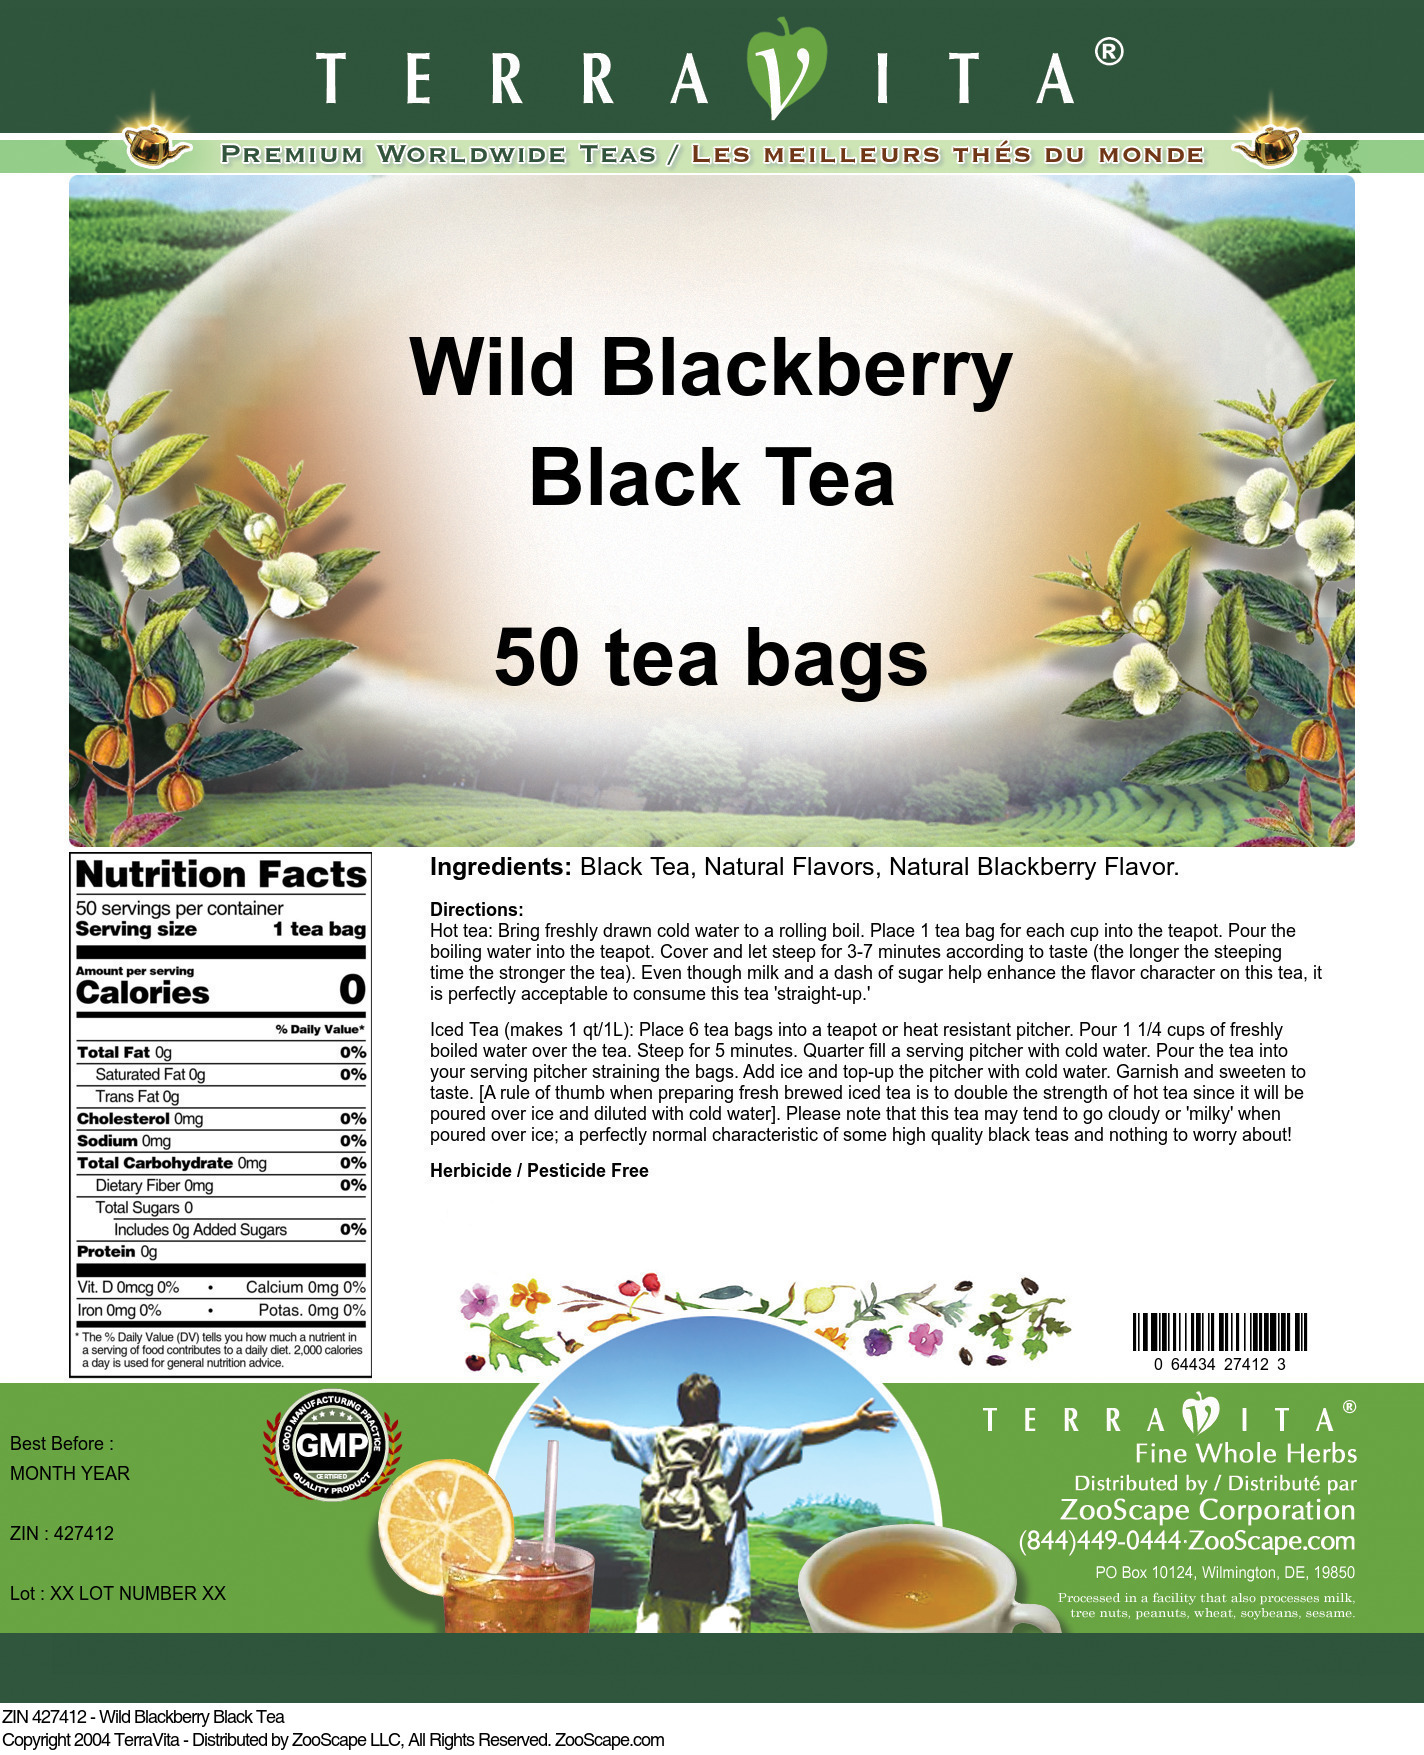 Wild Blackberry Black Tea